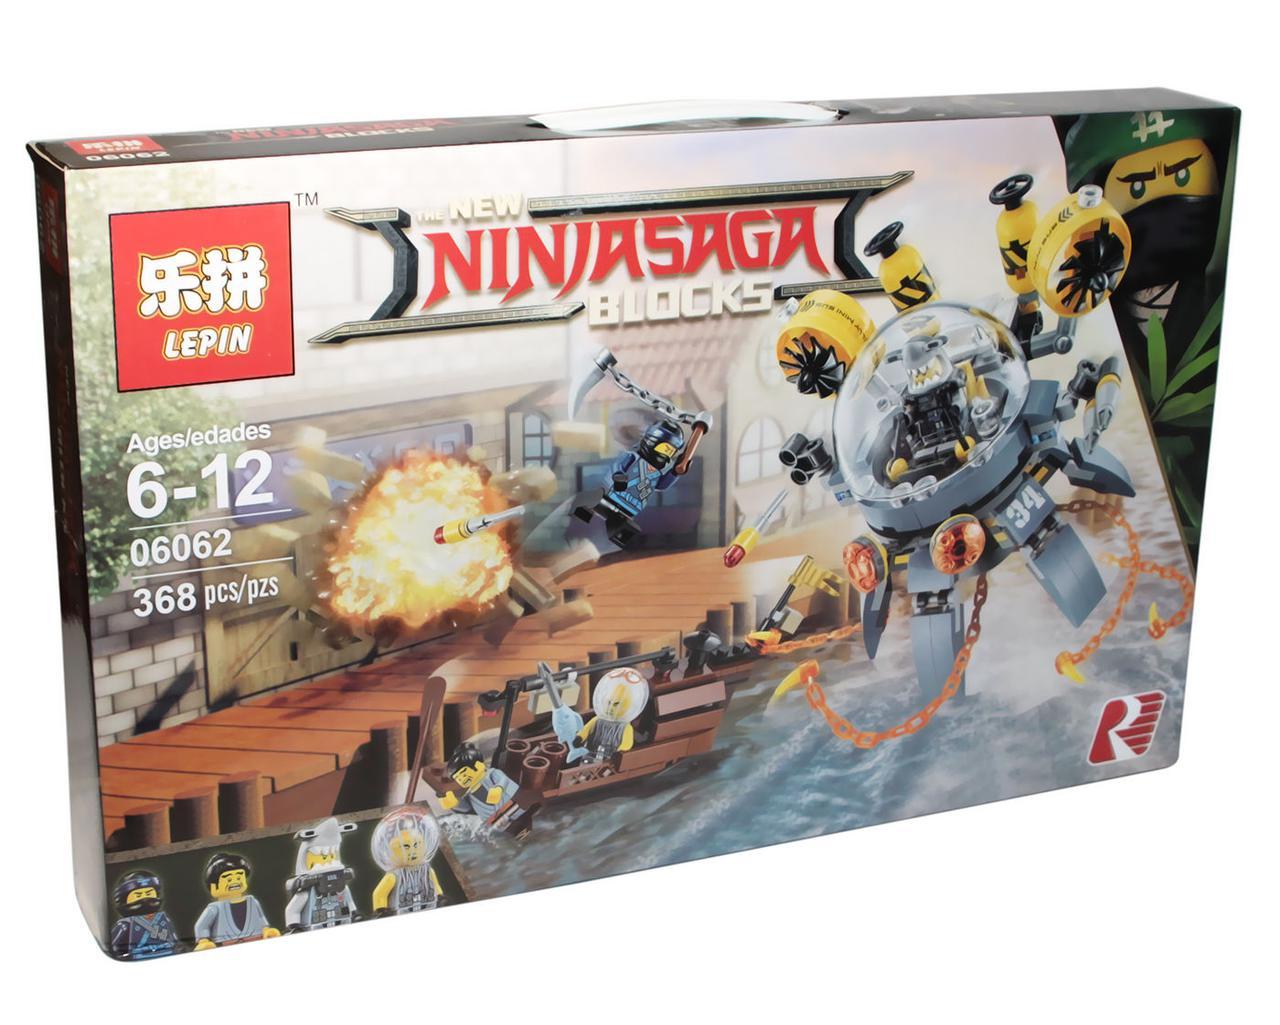 Конструктор аналог лего Lepin Ниндзяго (Летающая подводная лодка), 368